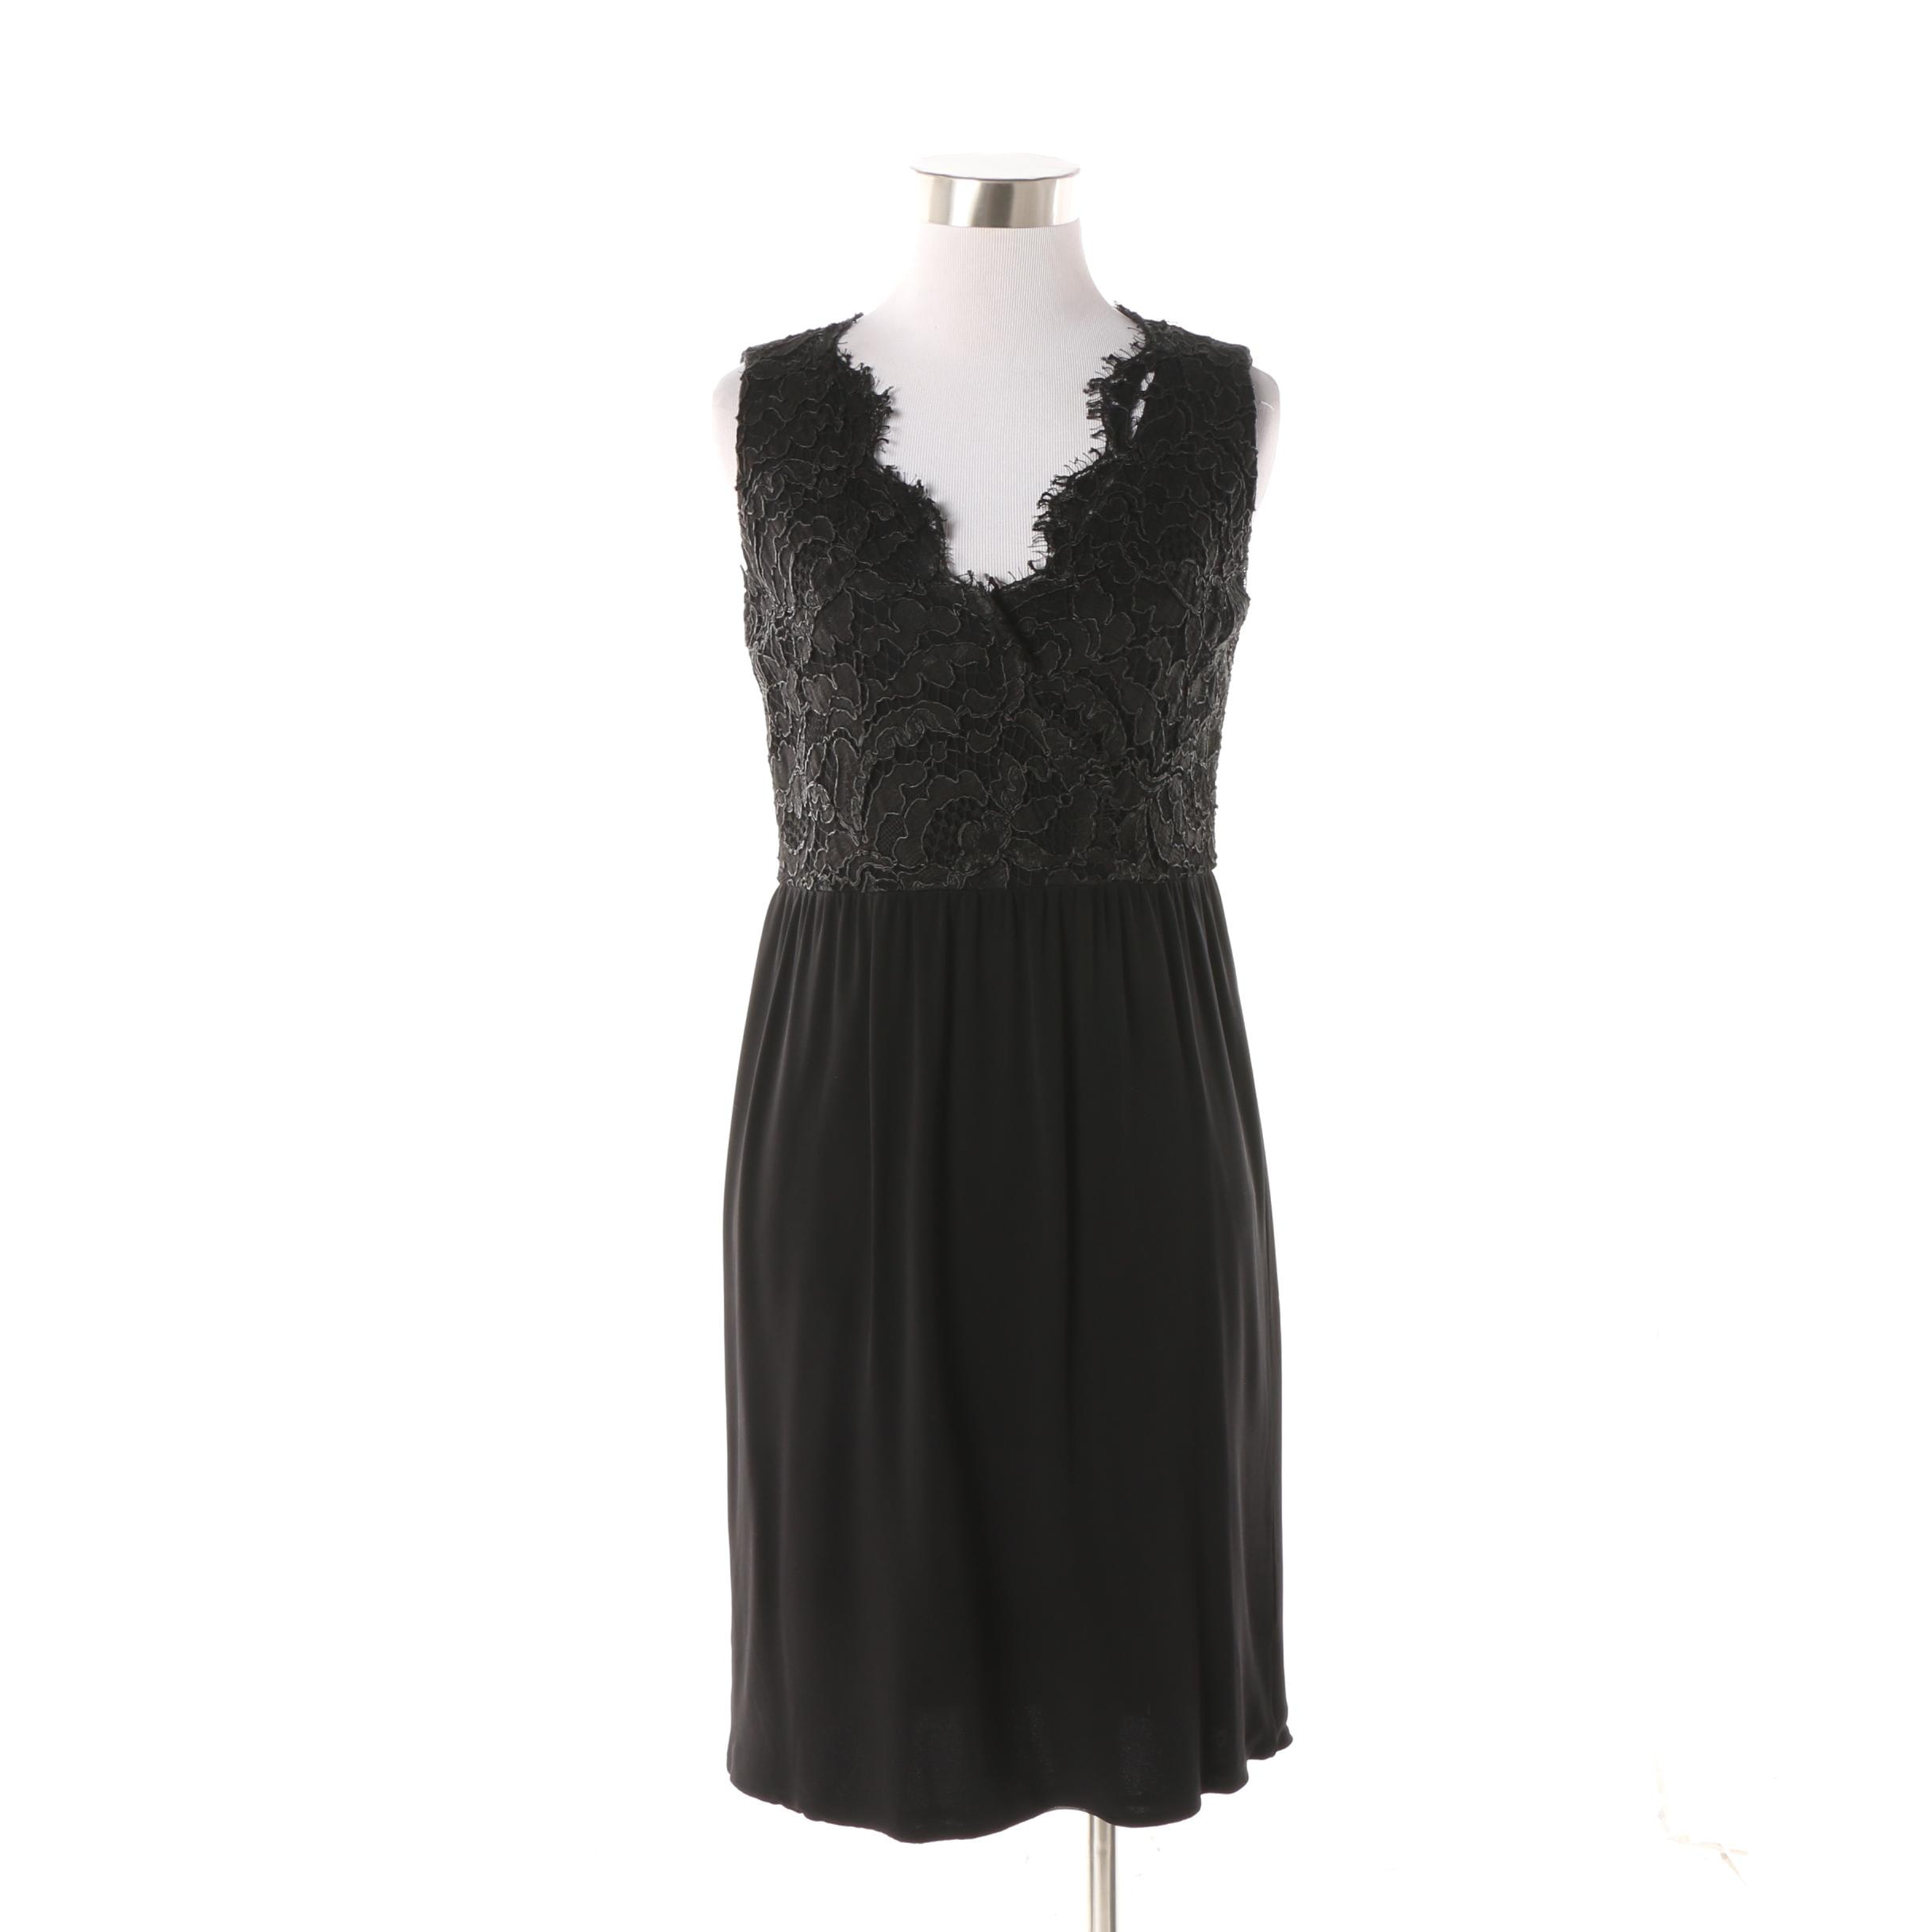 Gucci Black Lace Bodice Sleeveless Cocktail Dress